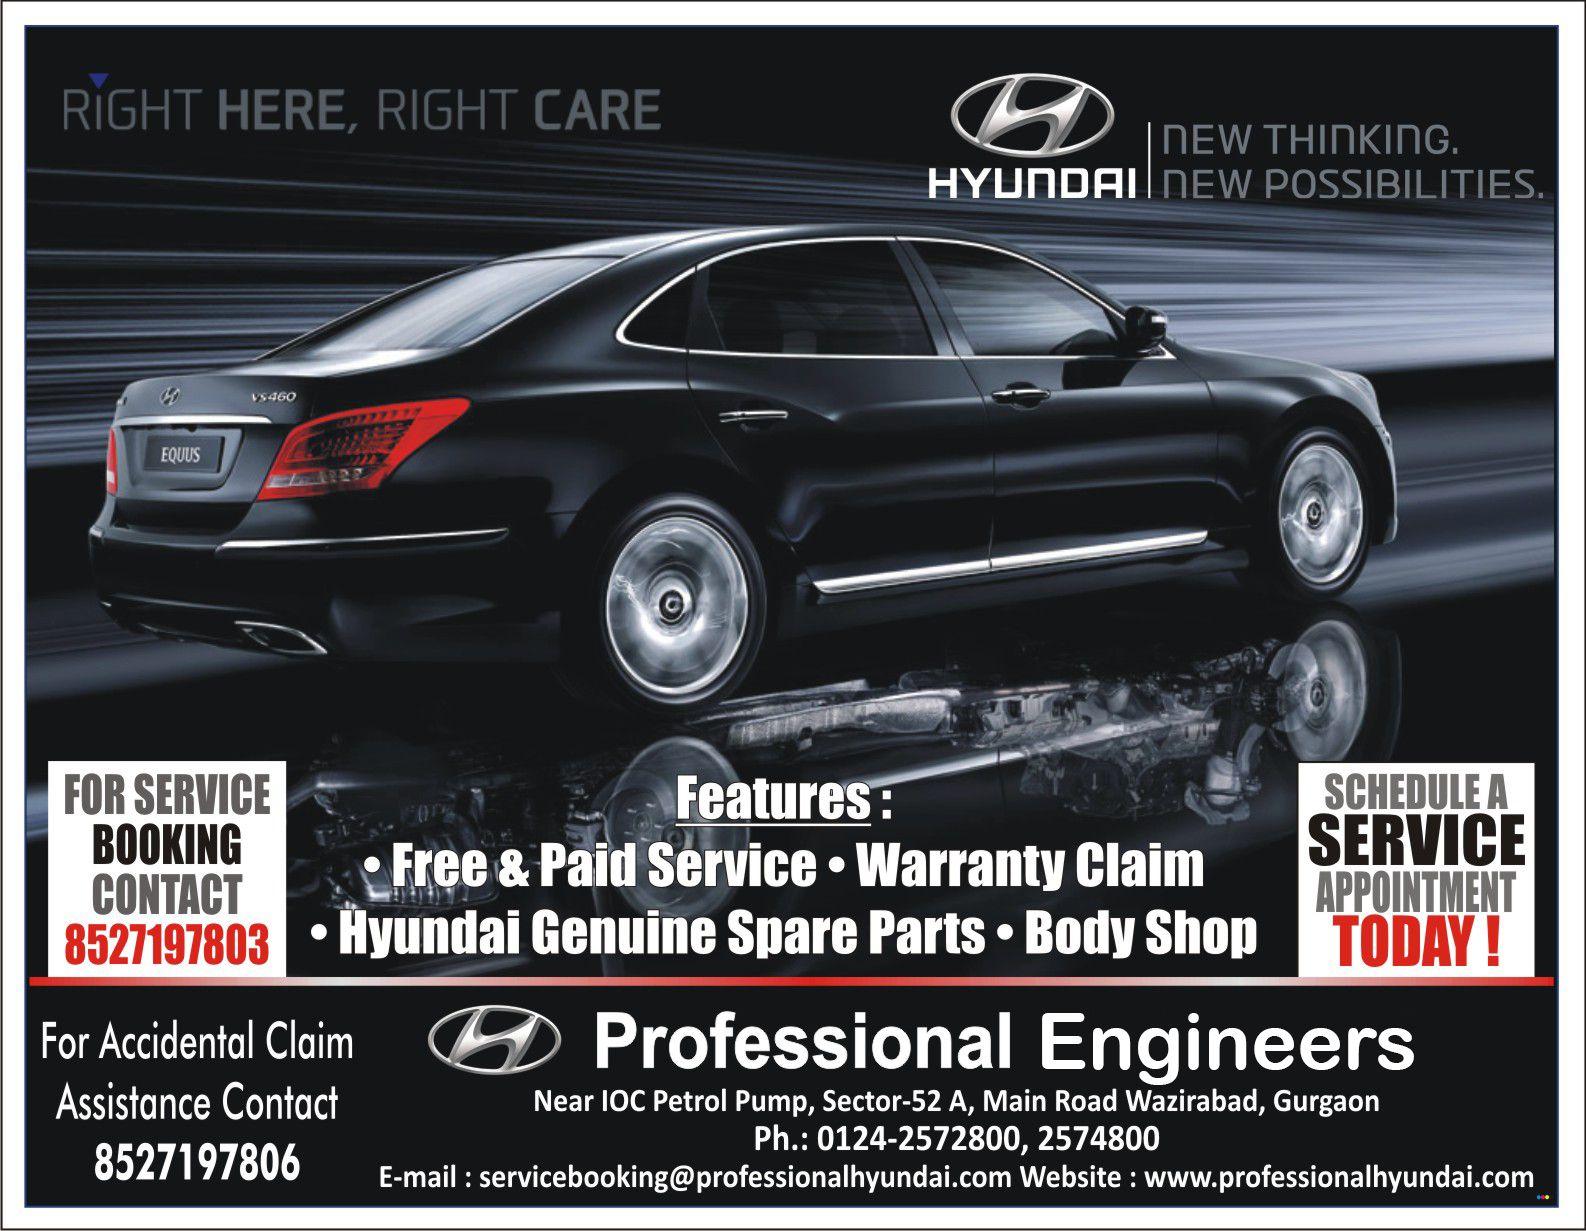 Get Your Hyundai Car Service Today Hyundai Cars New Hyundai Car Wash Equipment